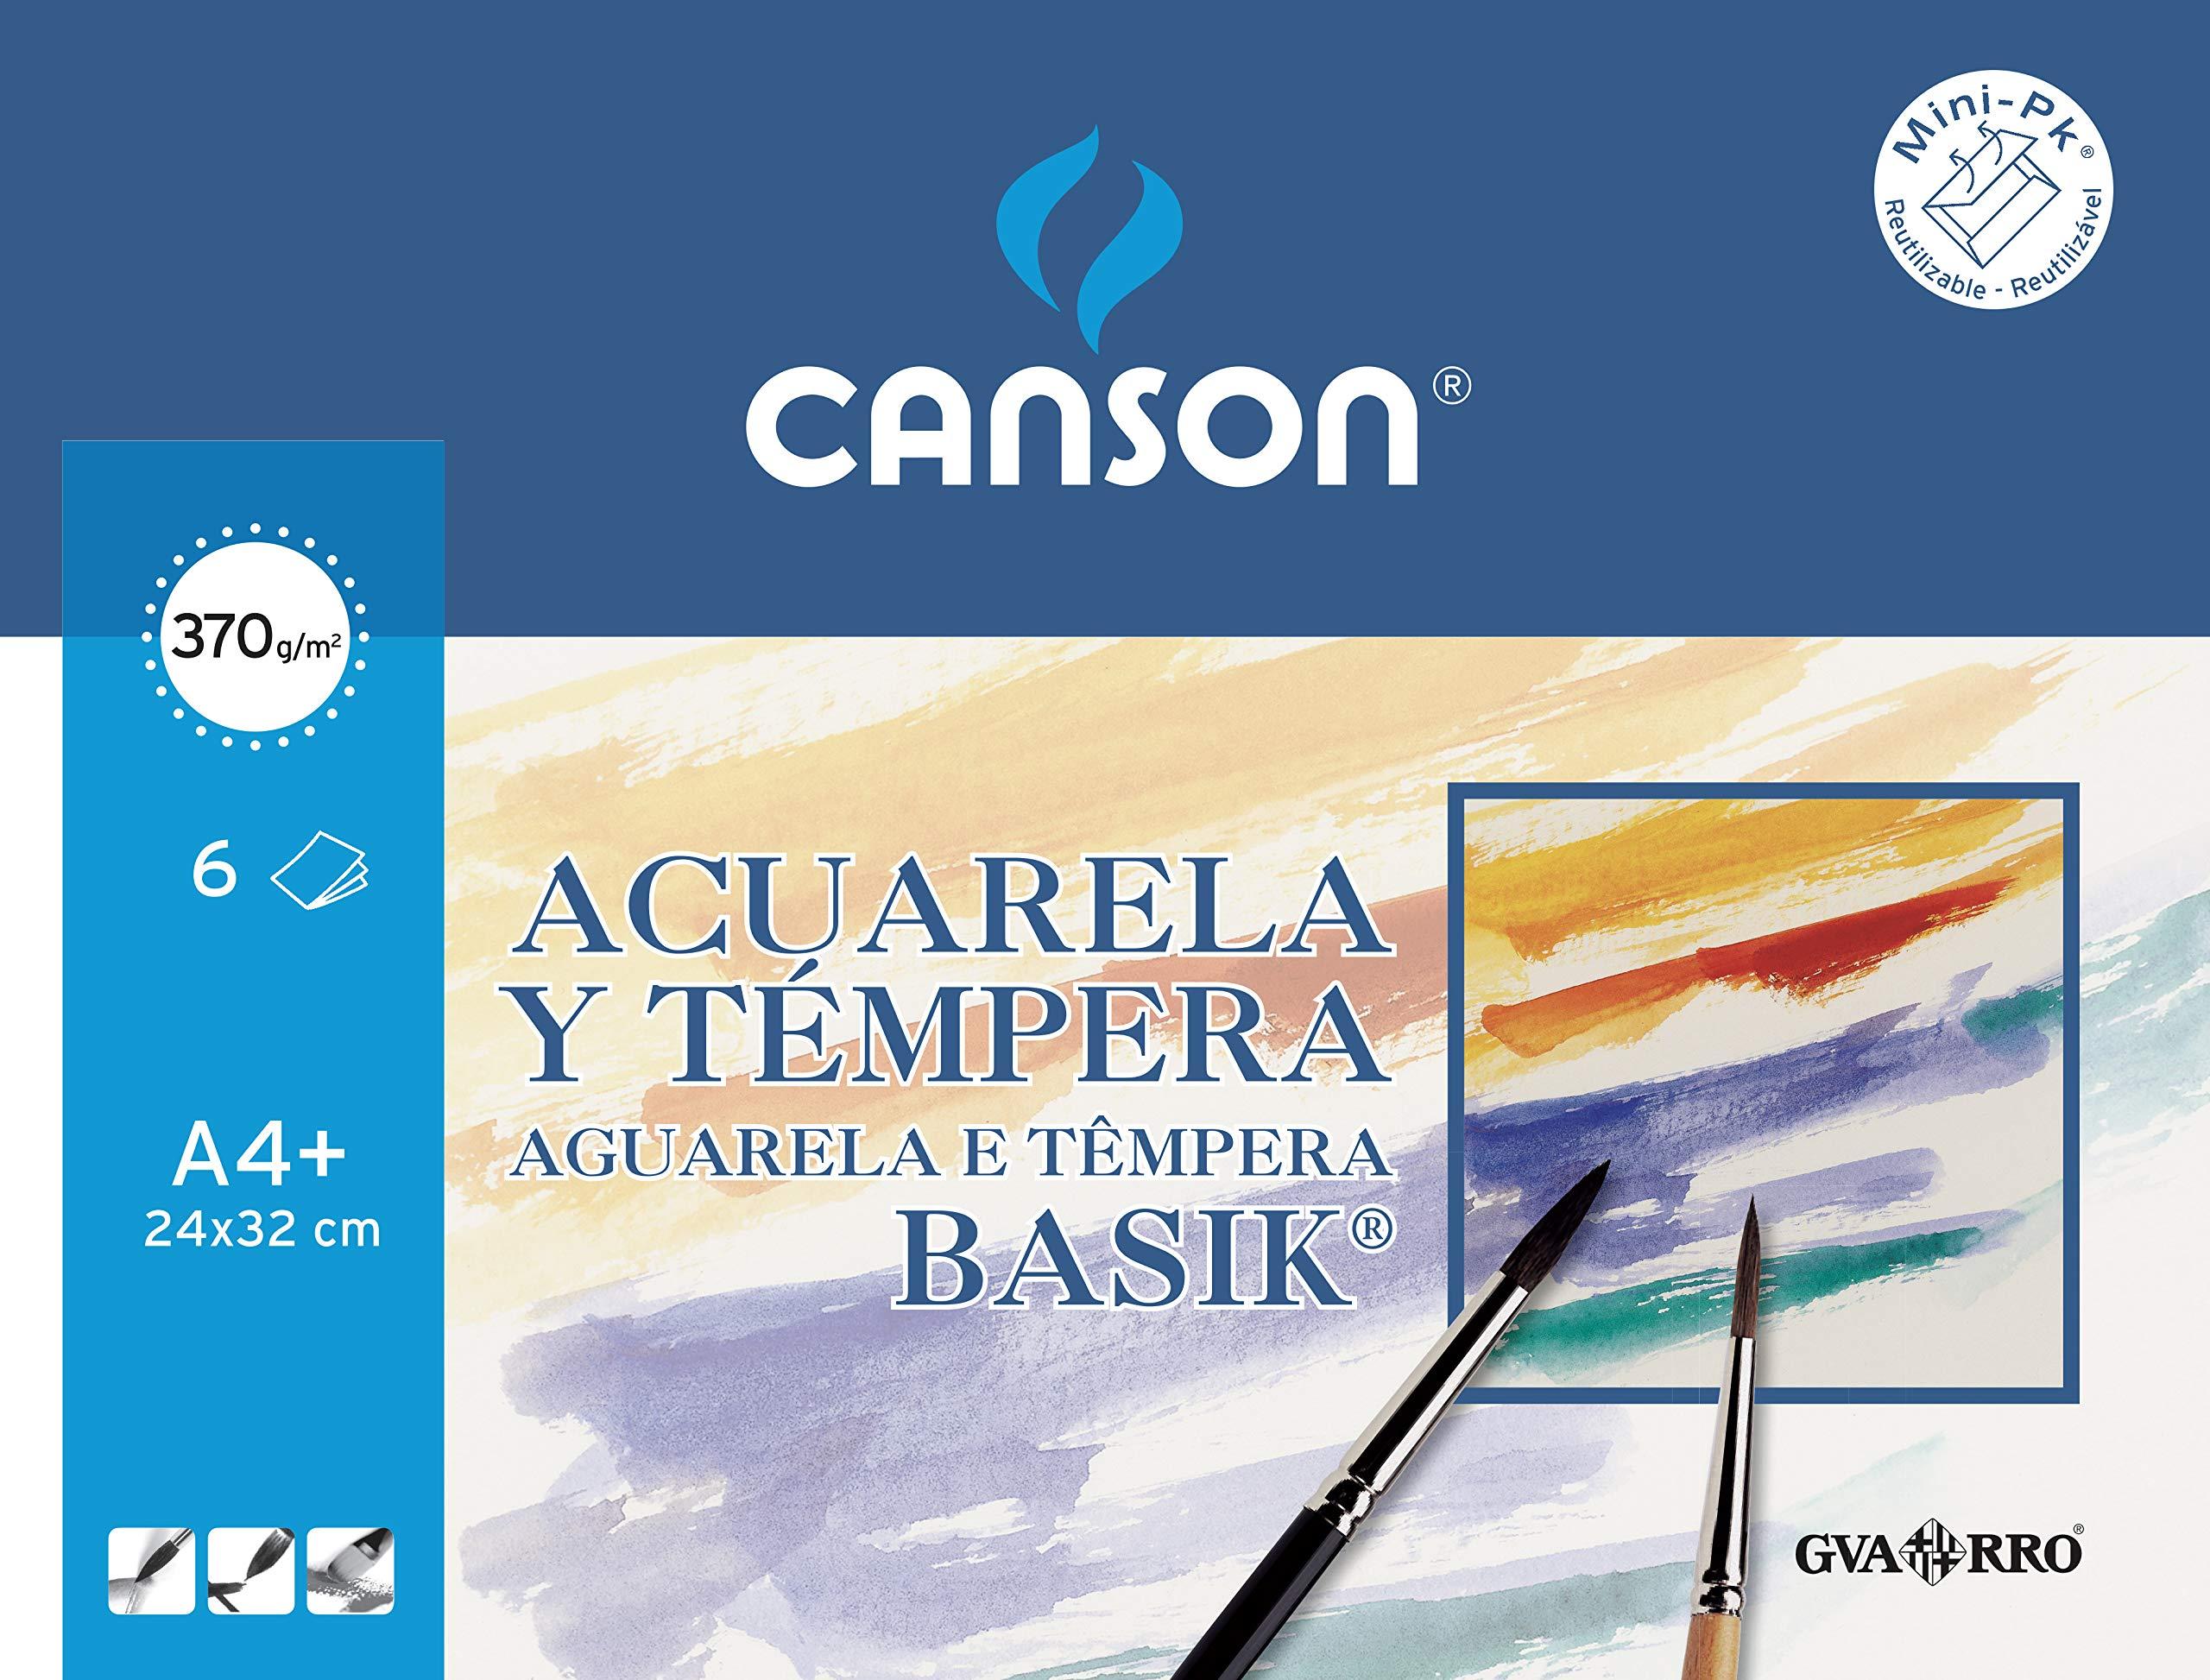 Canson 406347 – Papel para acuarela, 6 hojas